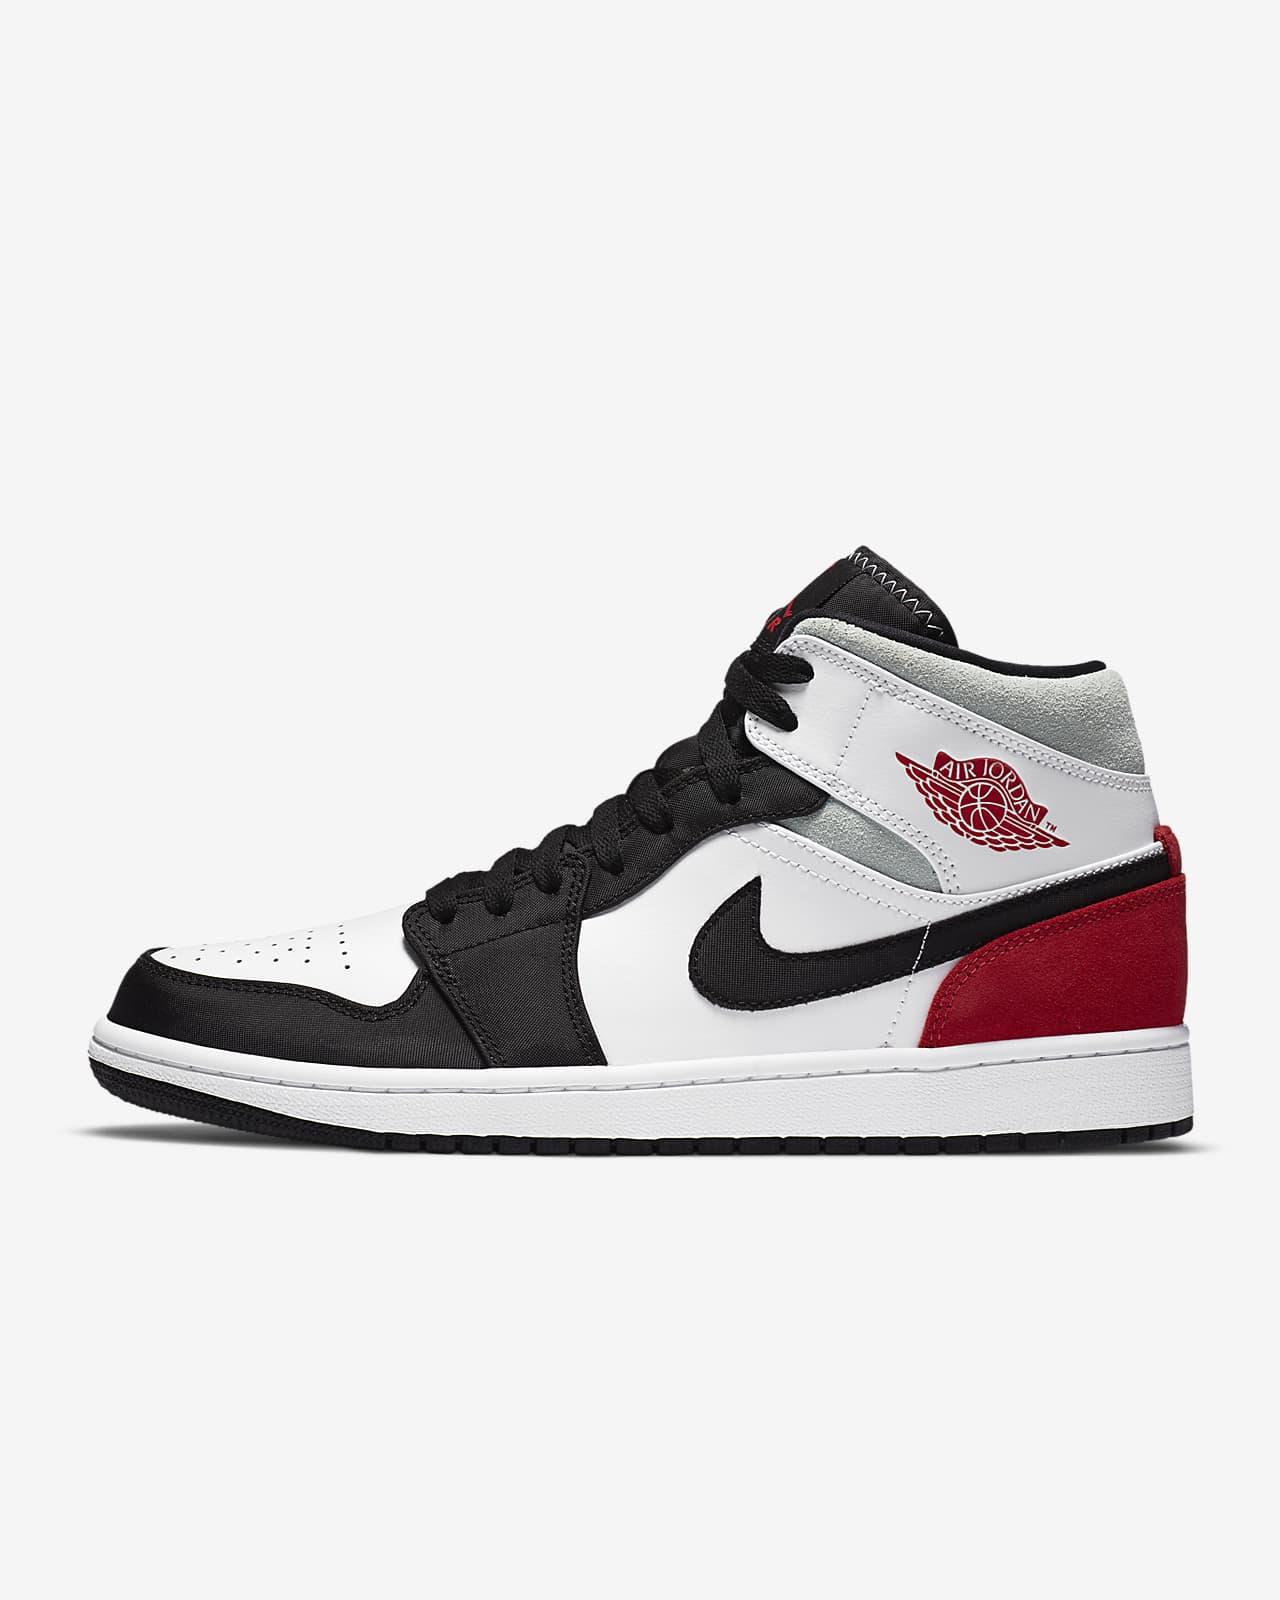 Air Jordan 1 Mid SE Men's Shoes